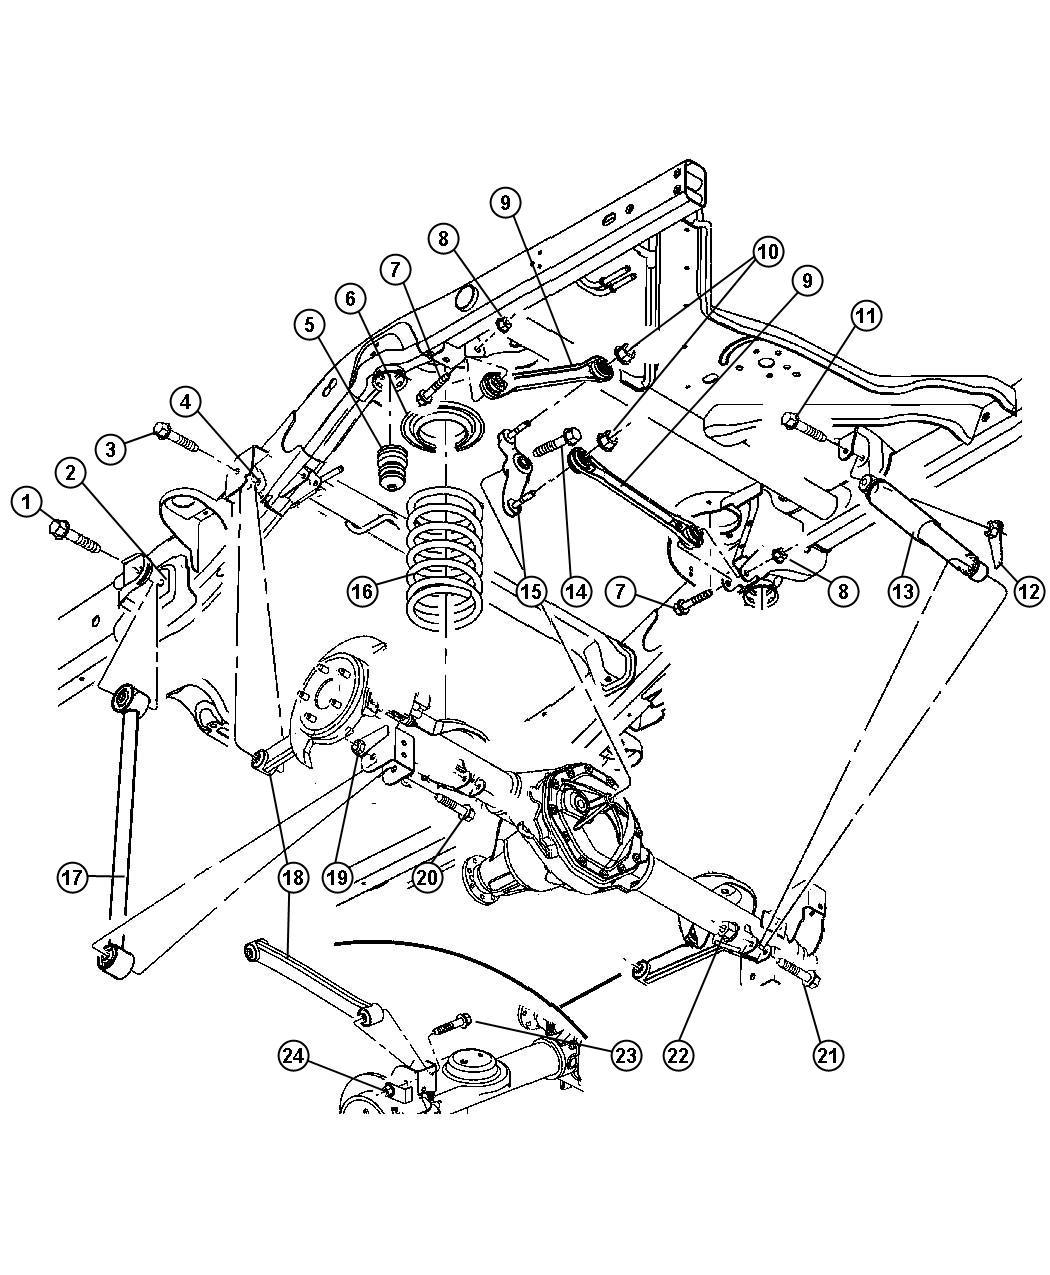 2009 Chrysler Aspen Bumper. Jounce. Rear, suspension